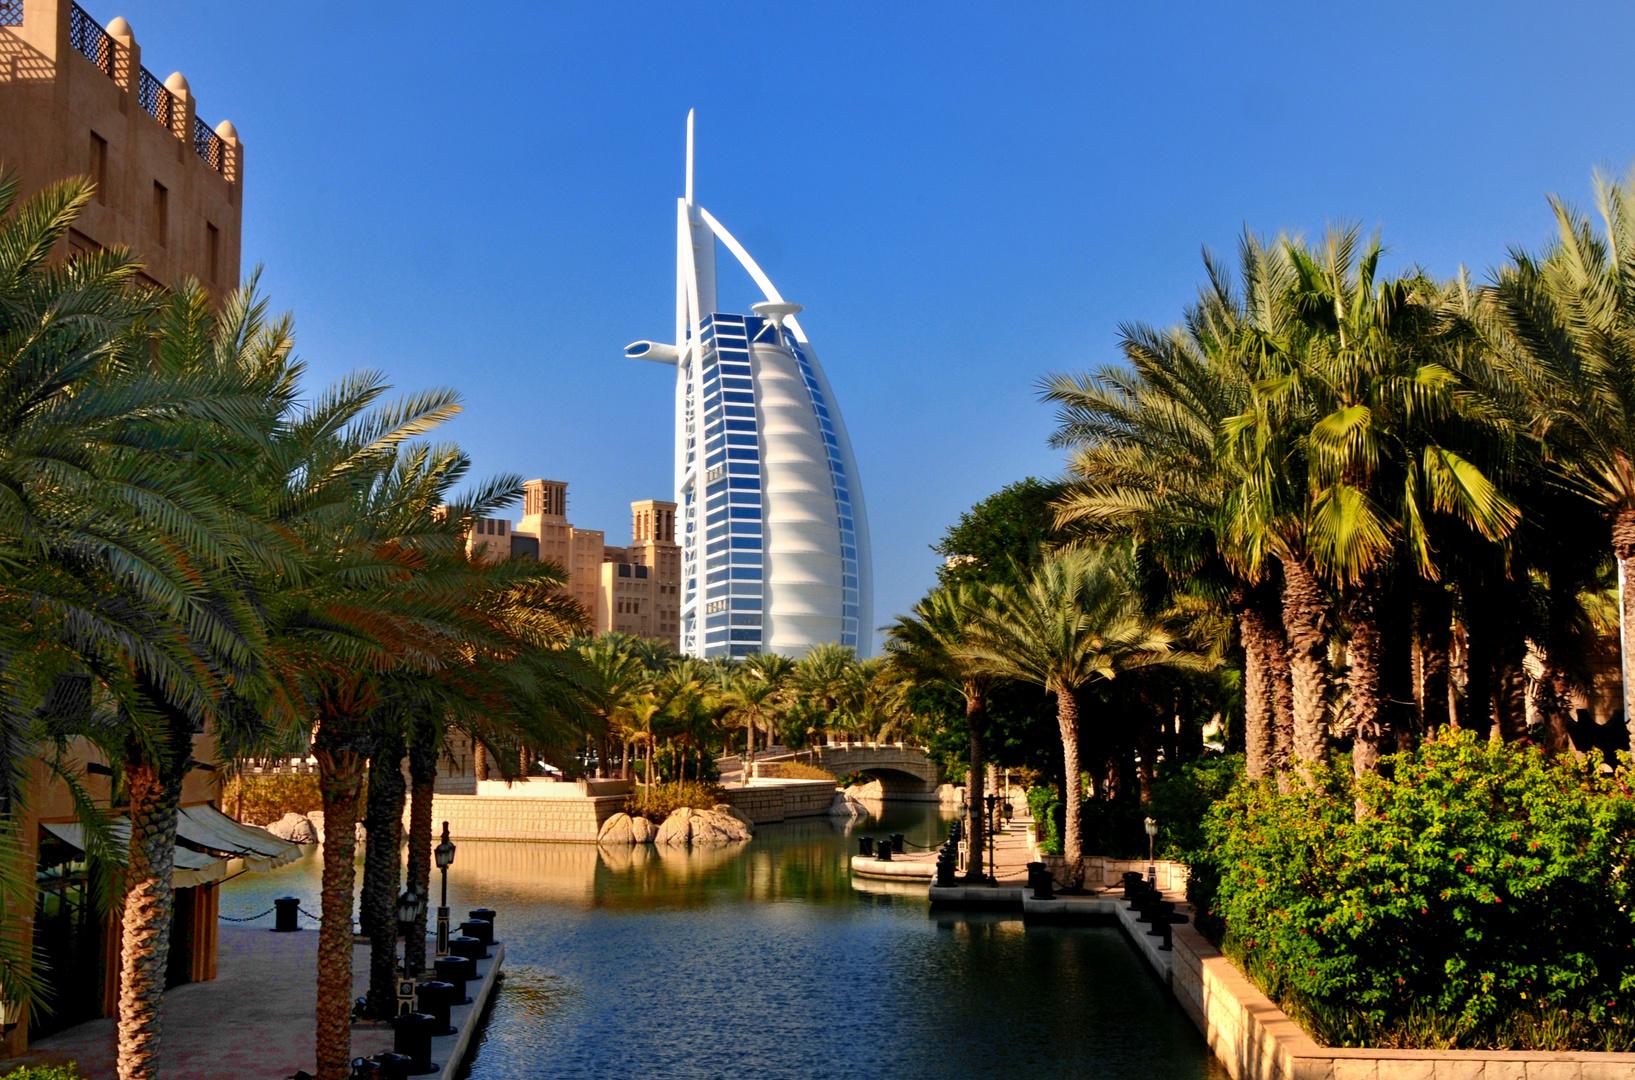 Madinat Jumeirah mit Burj Al Arab